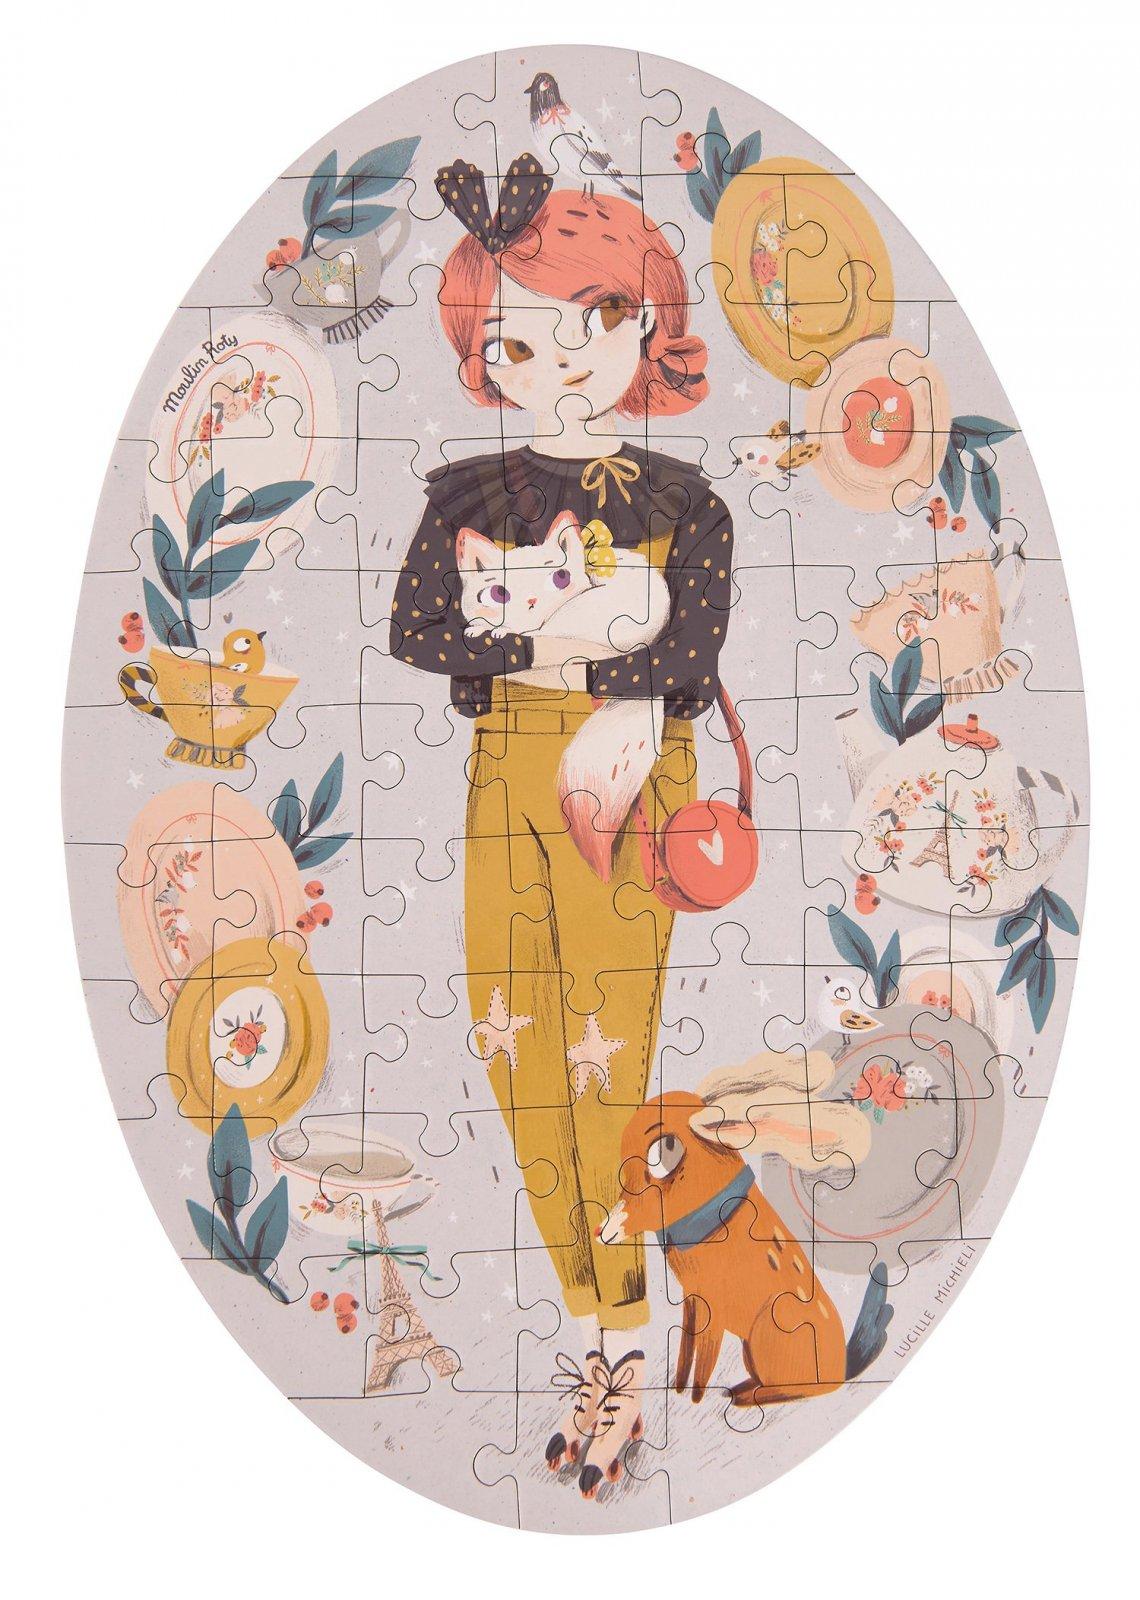 Le Parisiennes Constance 65 Piece Puzzle by Moulin Roty